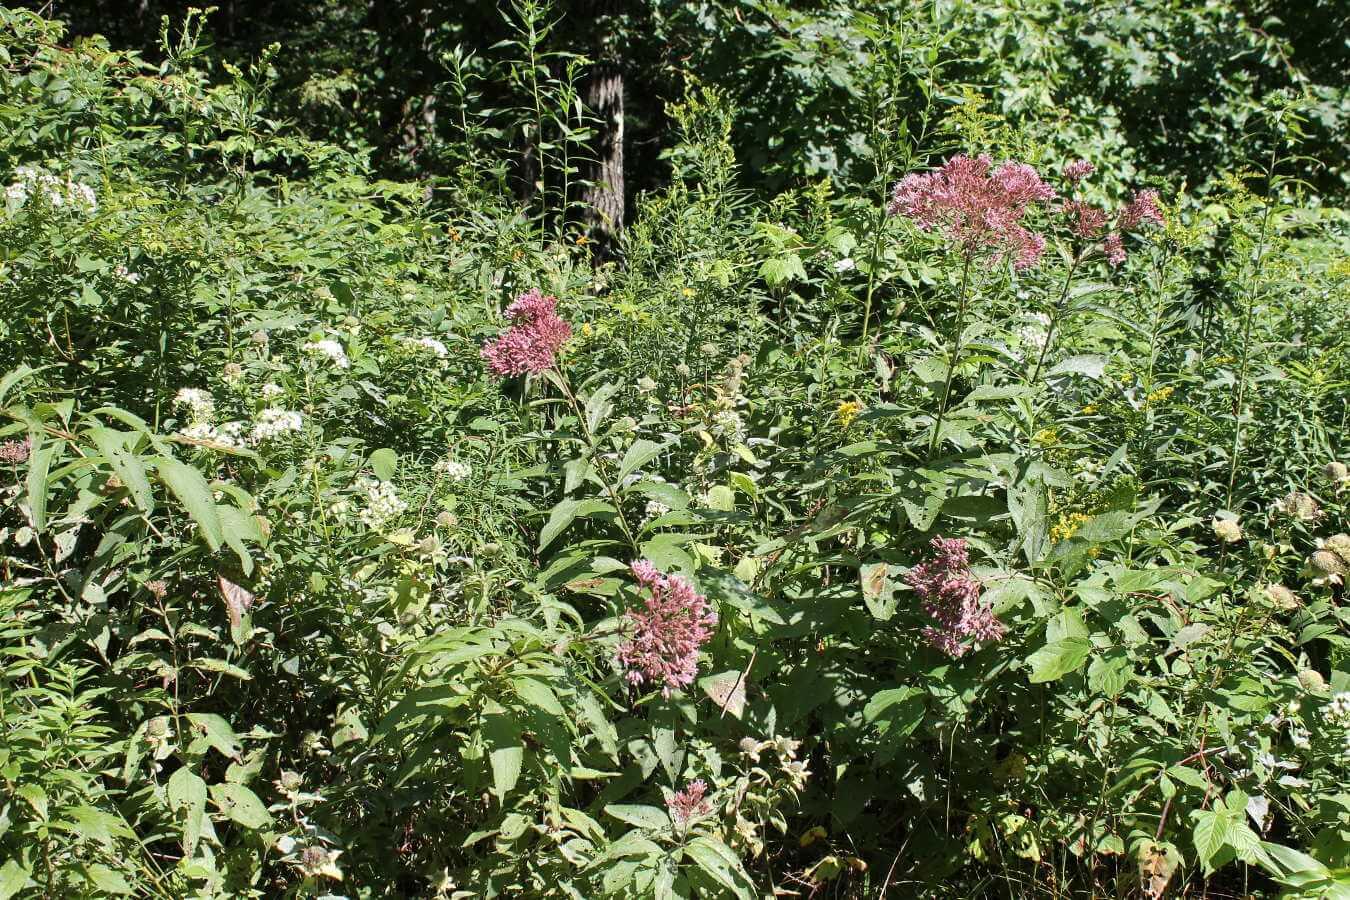 Photo of bushes at Alford Springs